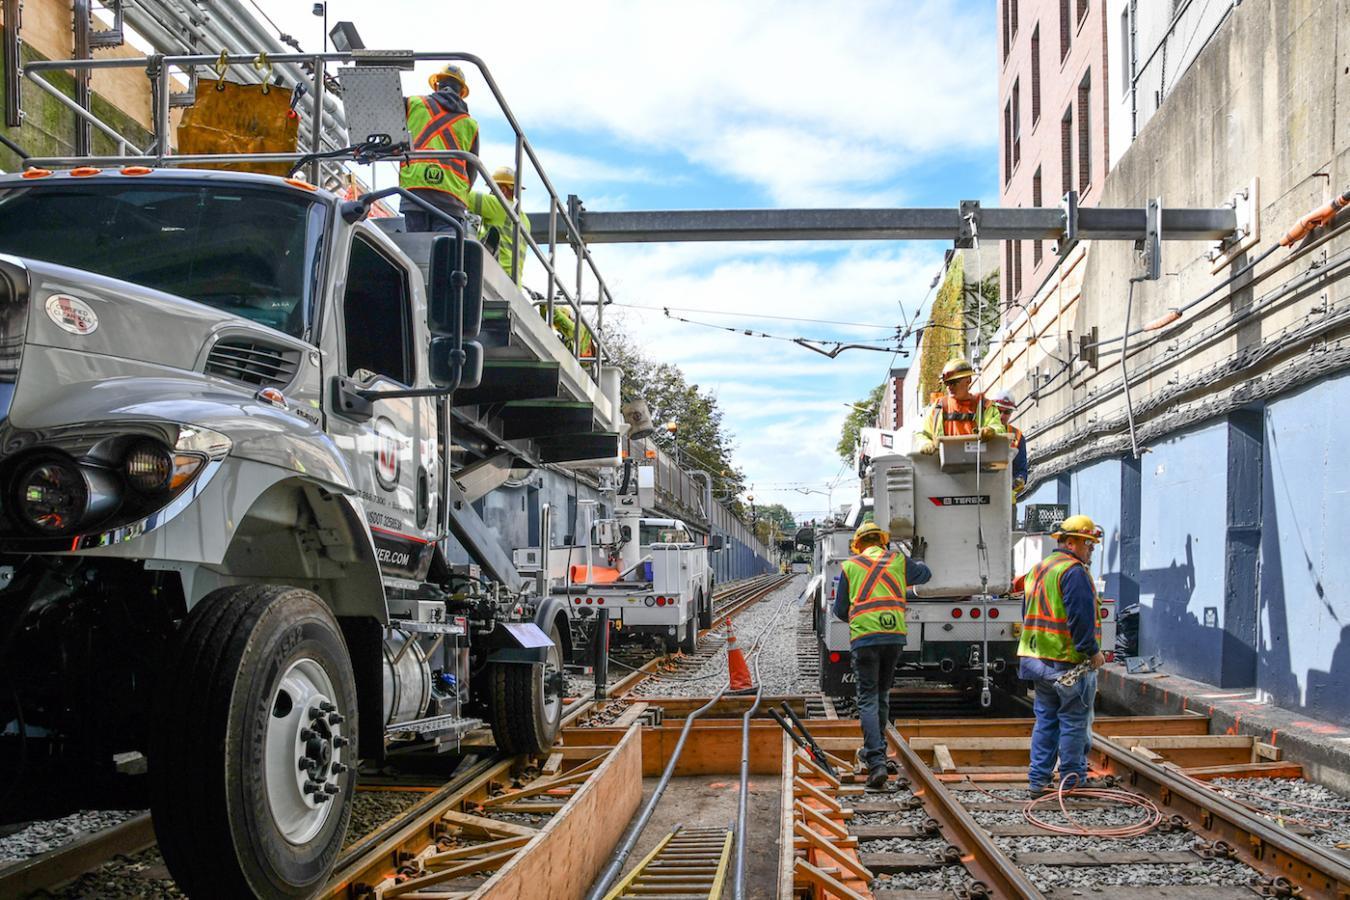 Crews work on the tracks near the Fenway Portal